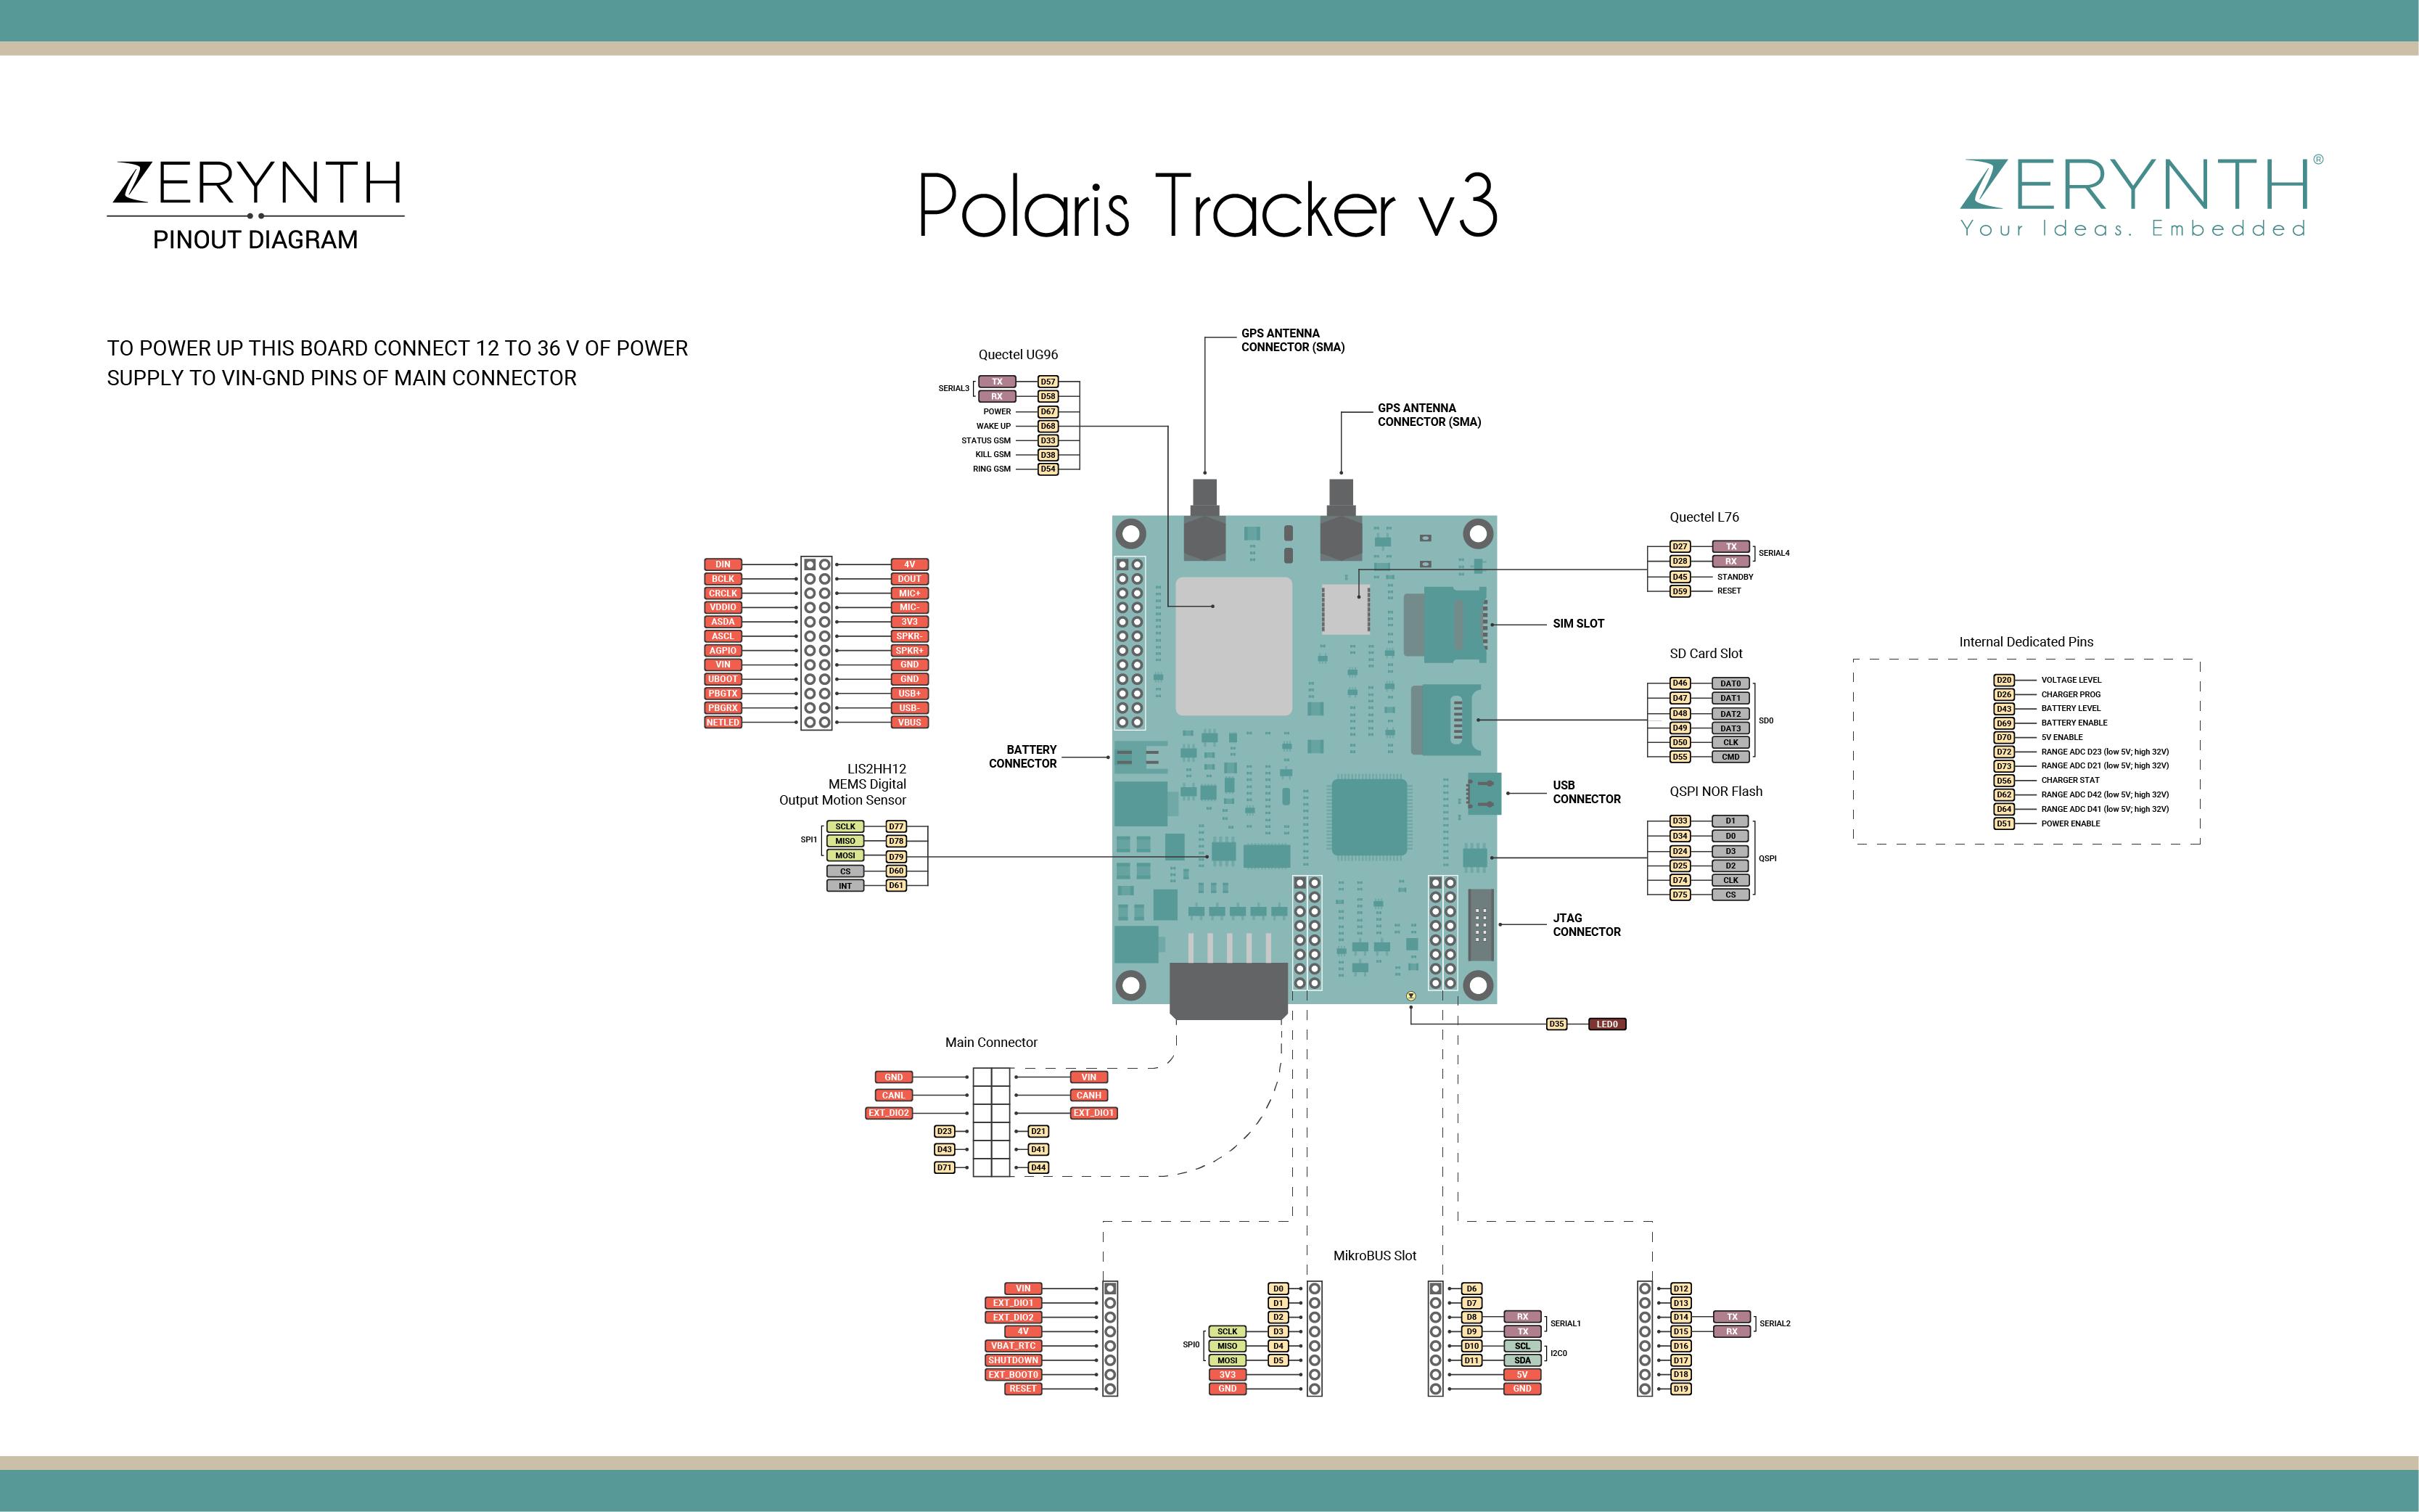 Polaris tracker image